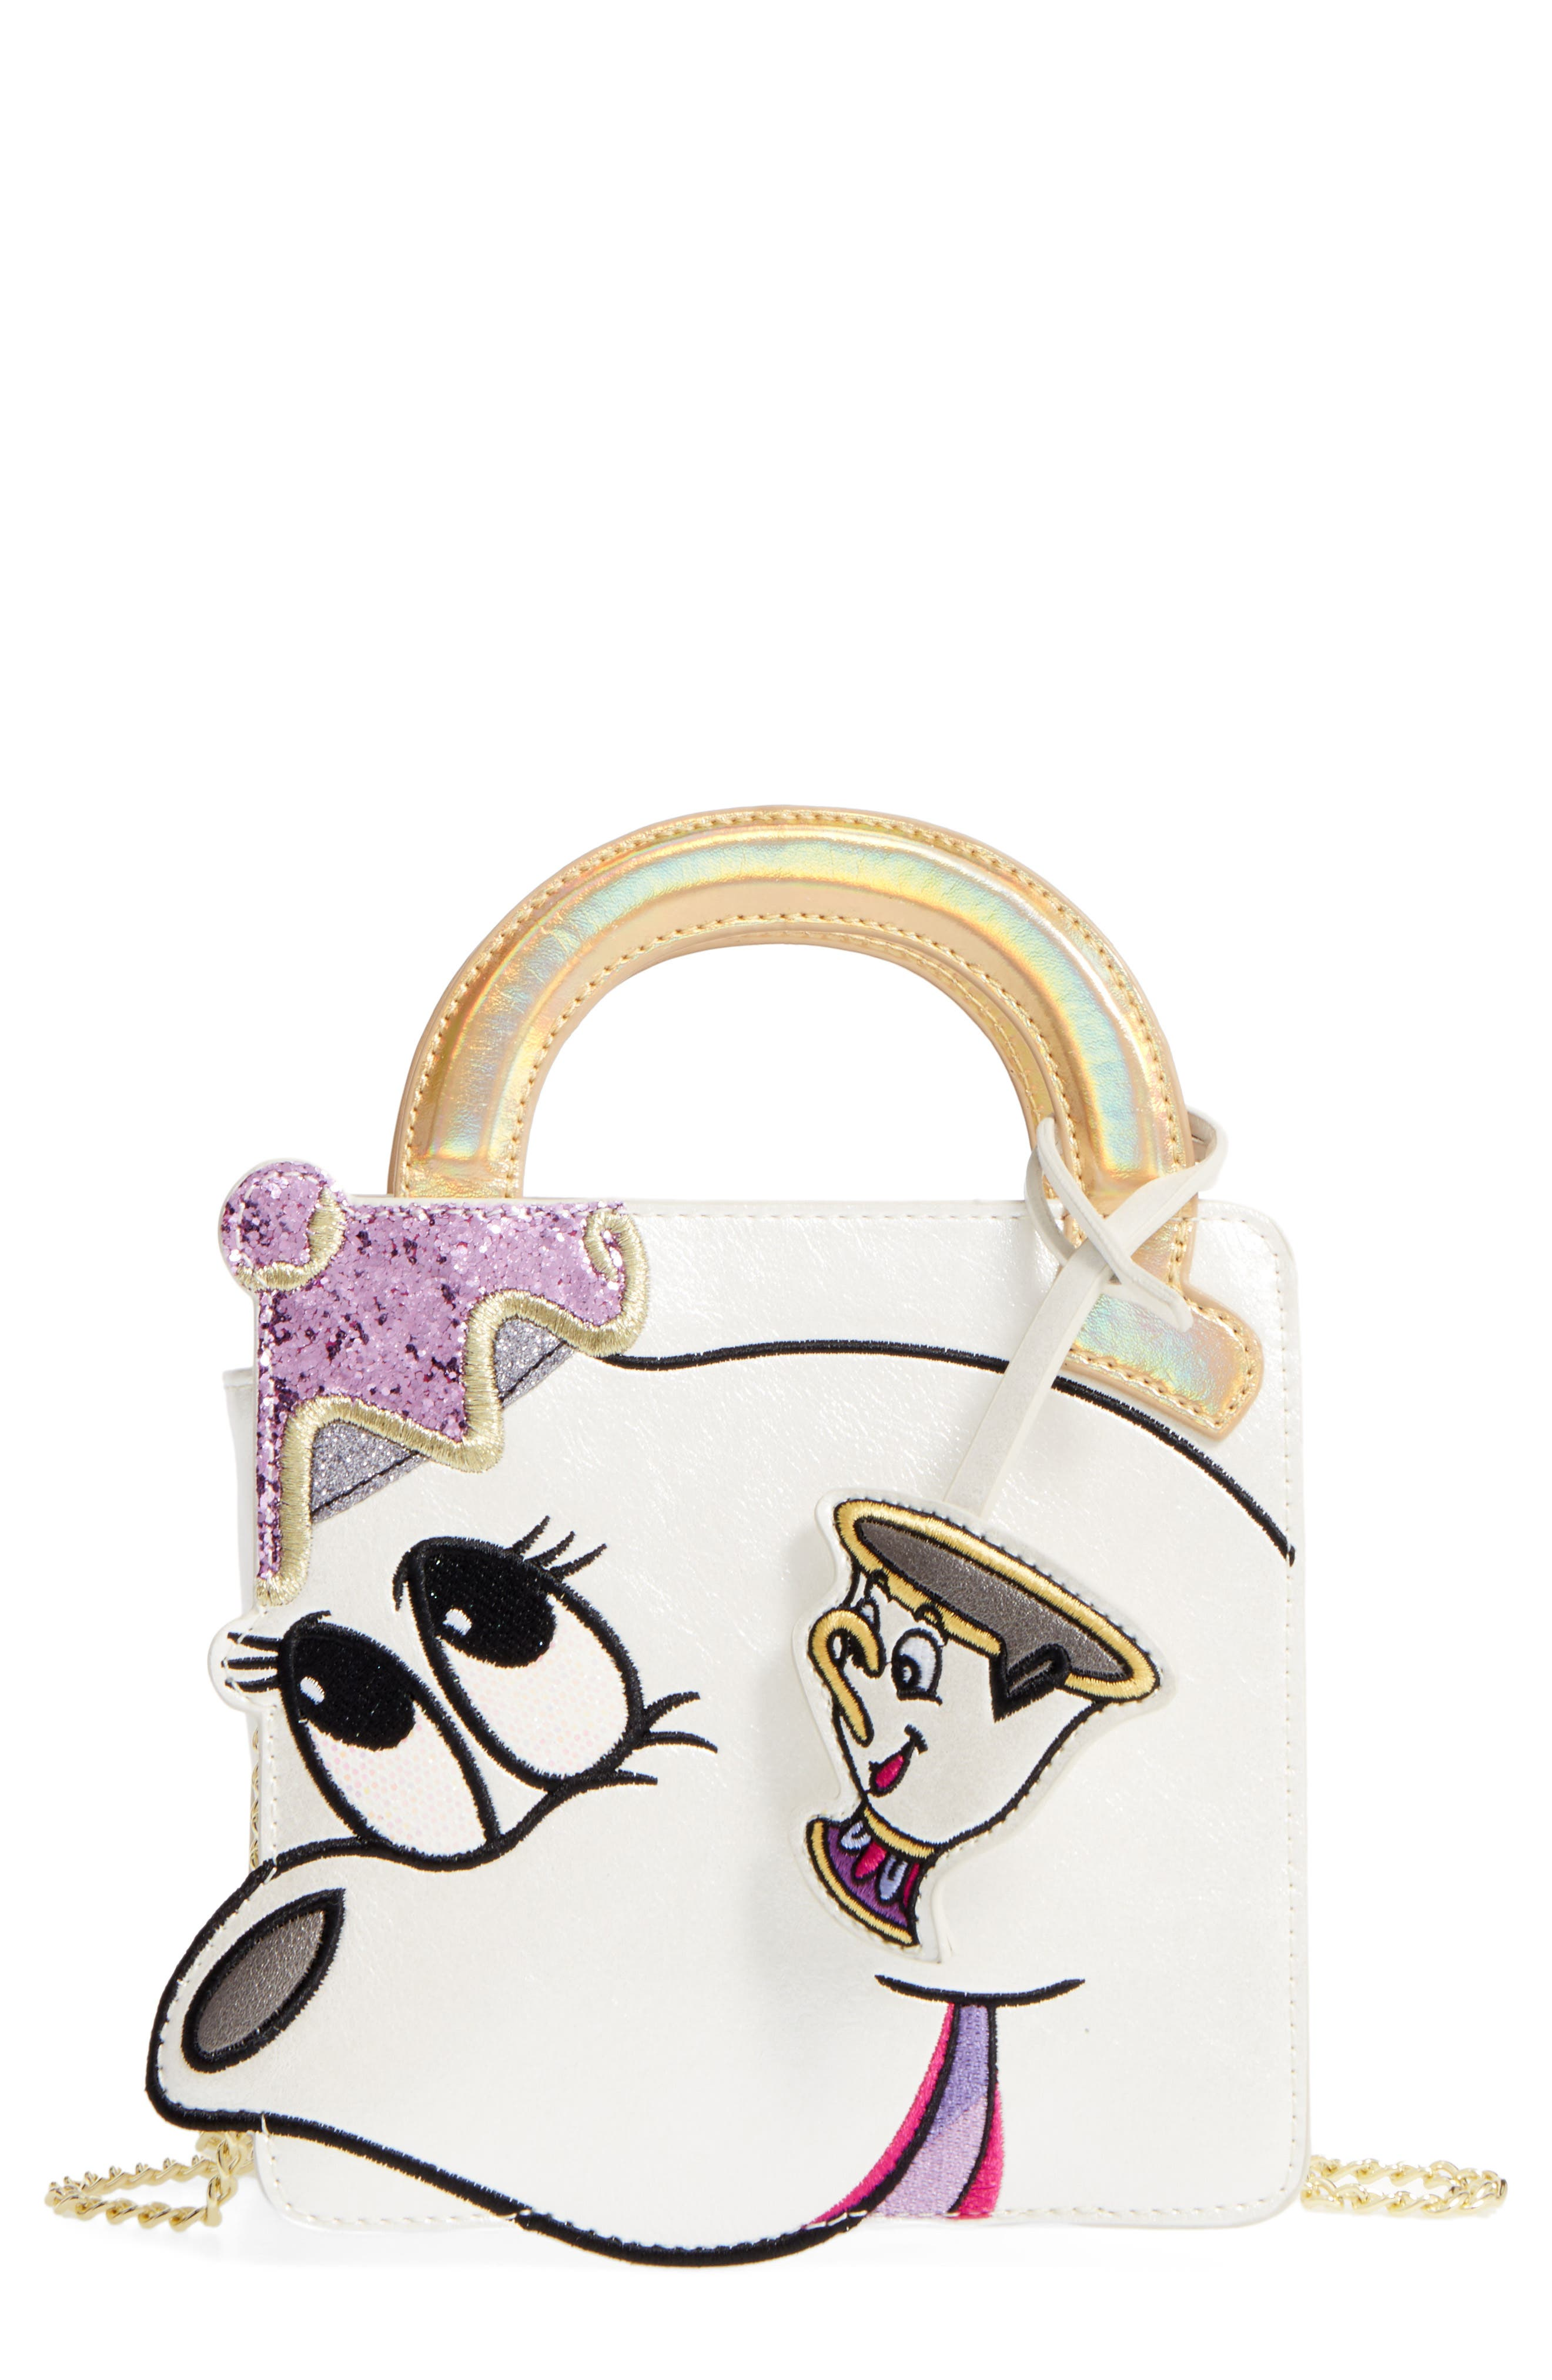 DANIELLE NICOLE,                             x Disney<sup>®</sup> Mrs. Potts & Chip Faux Leather Crossbody Bag,                             Main thumbnail 1, color,                             040